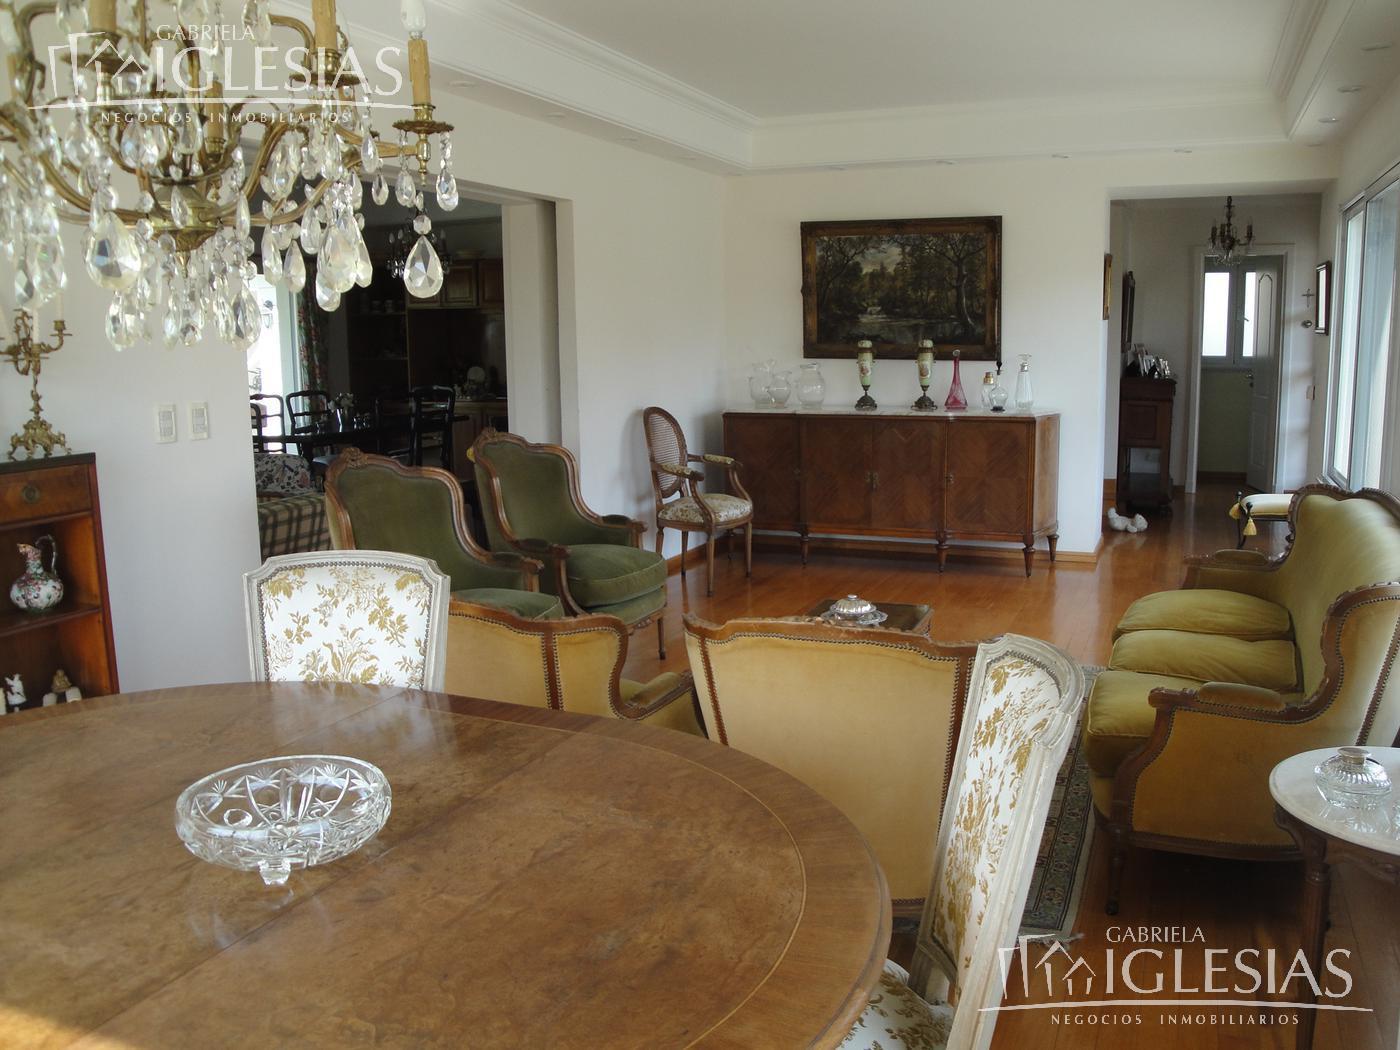 Casa en Alquiler temporario en Nordelta Las Glorietas a Alquiler temporario - $ 130.000